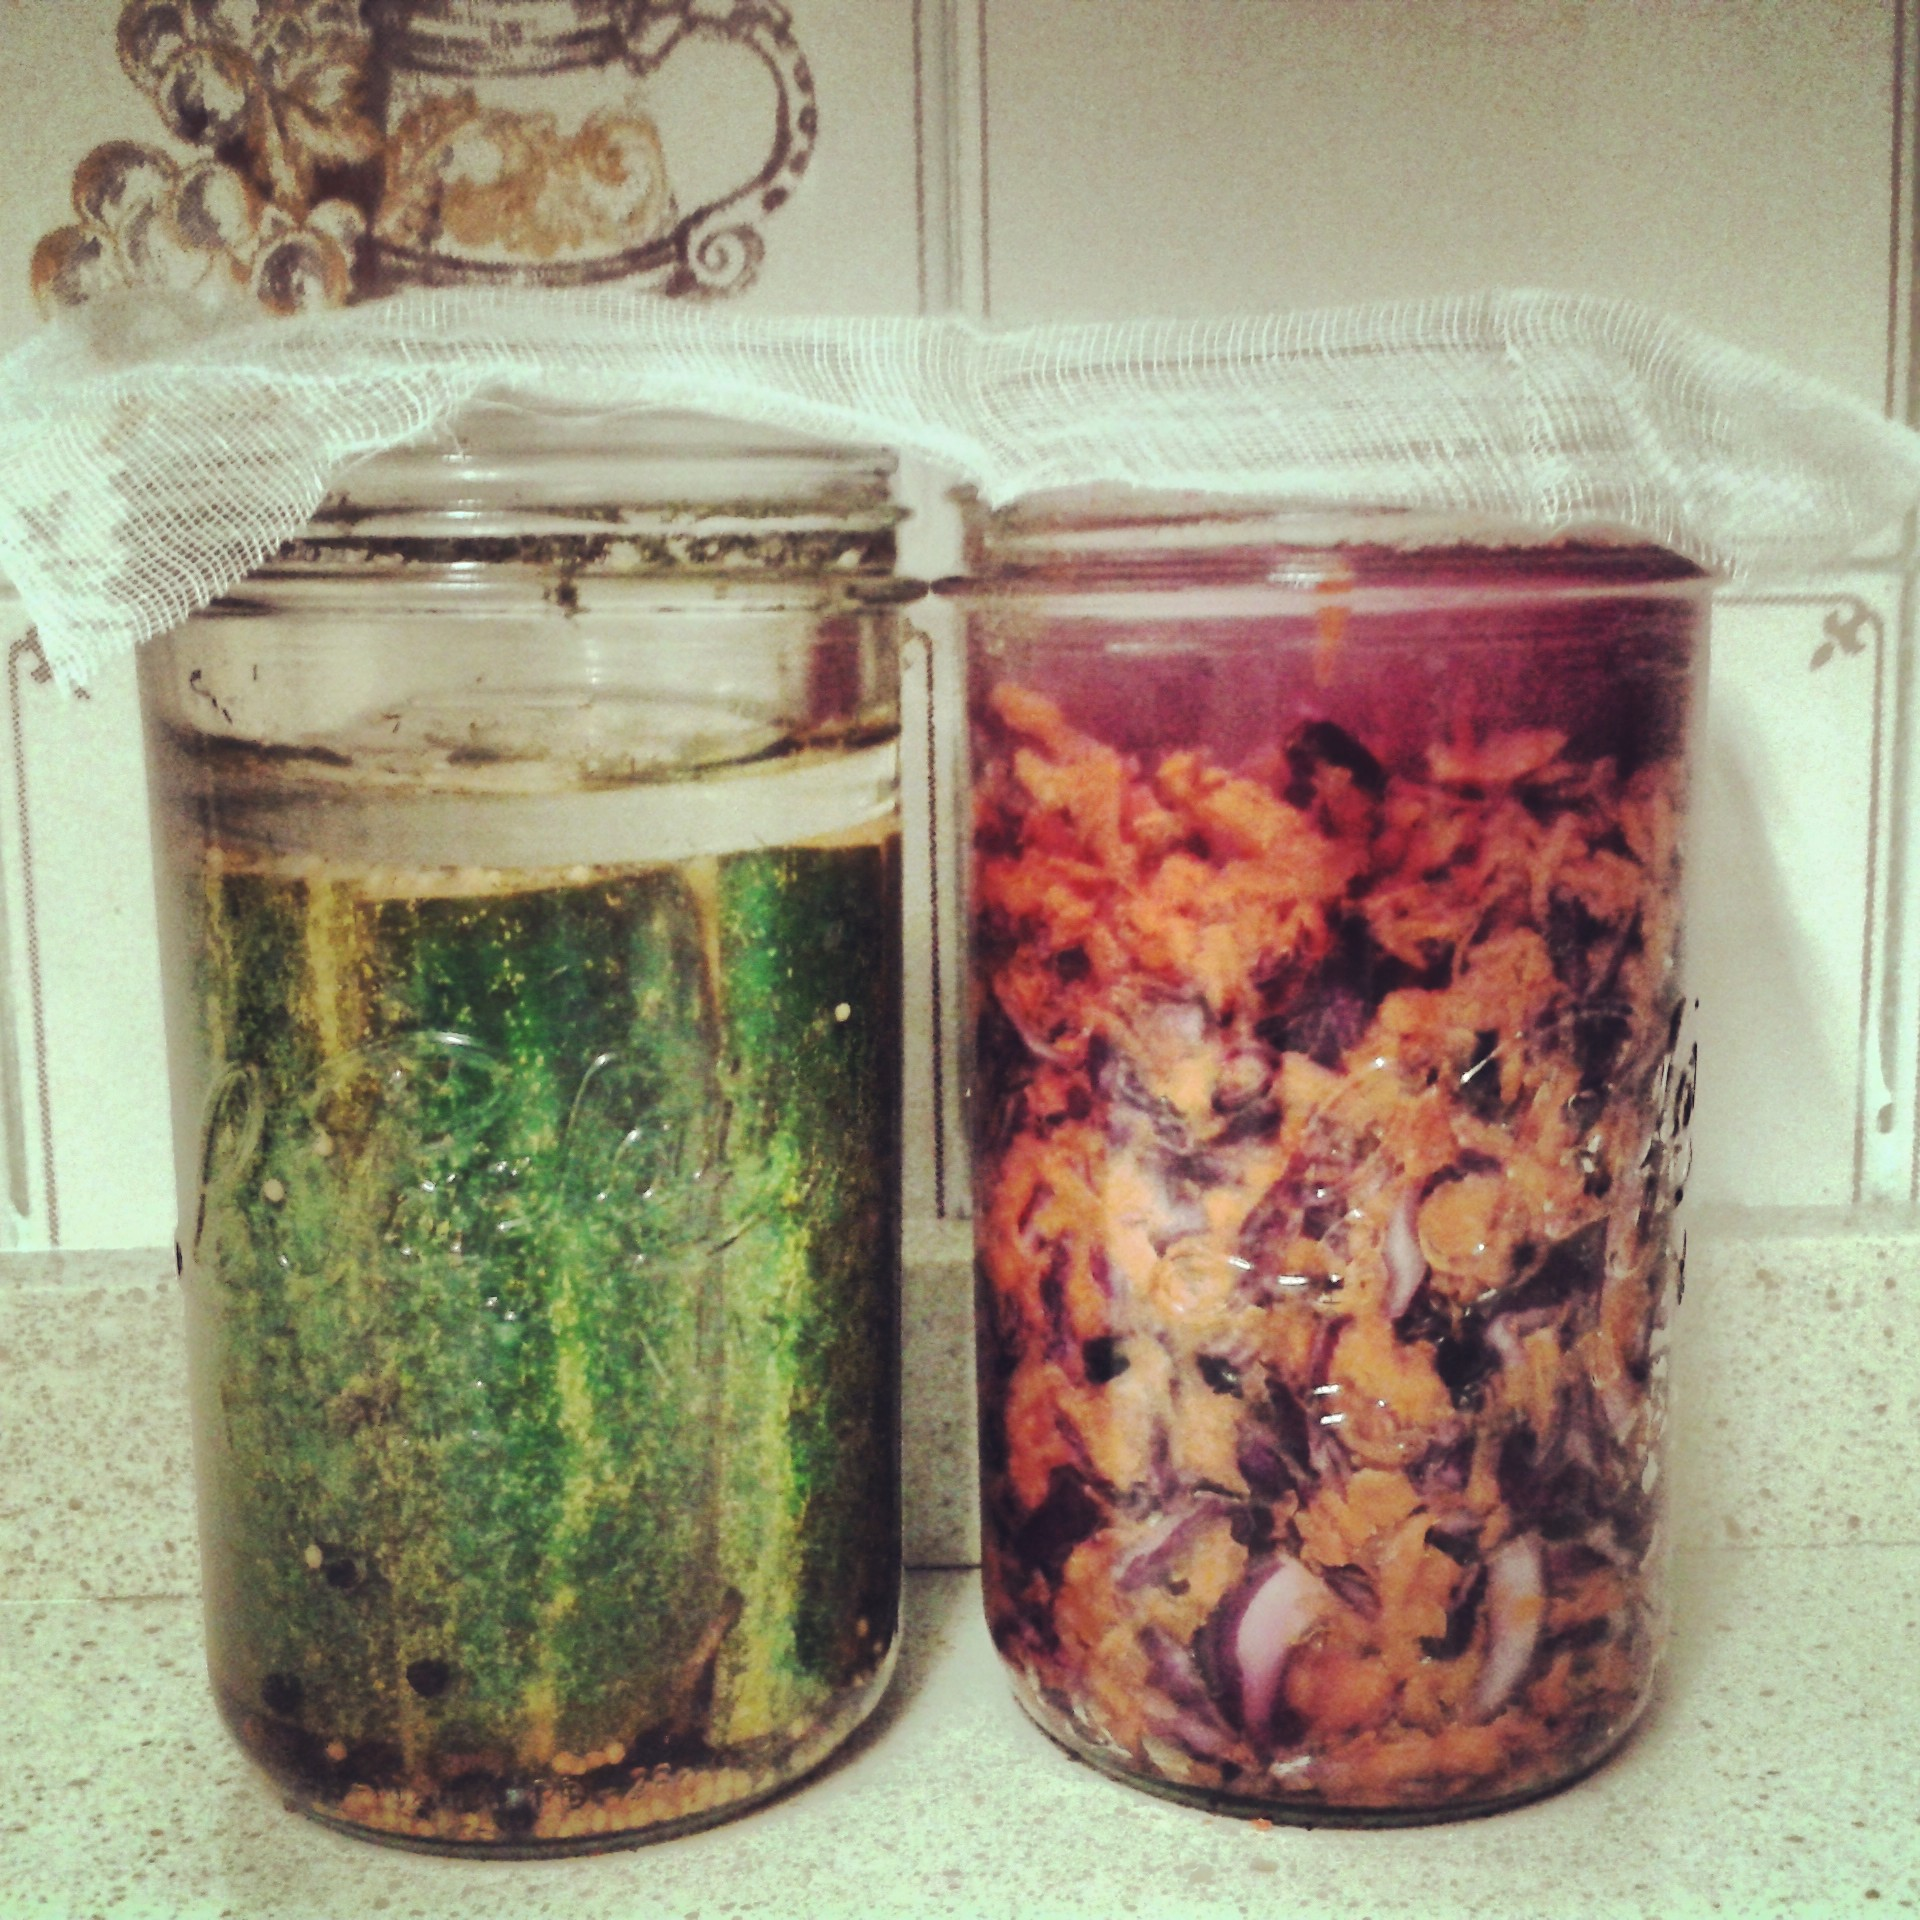 pickles en macrobiótica